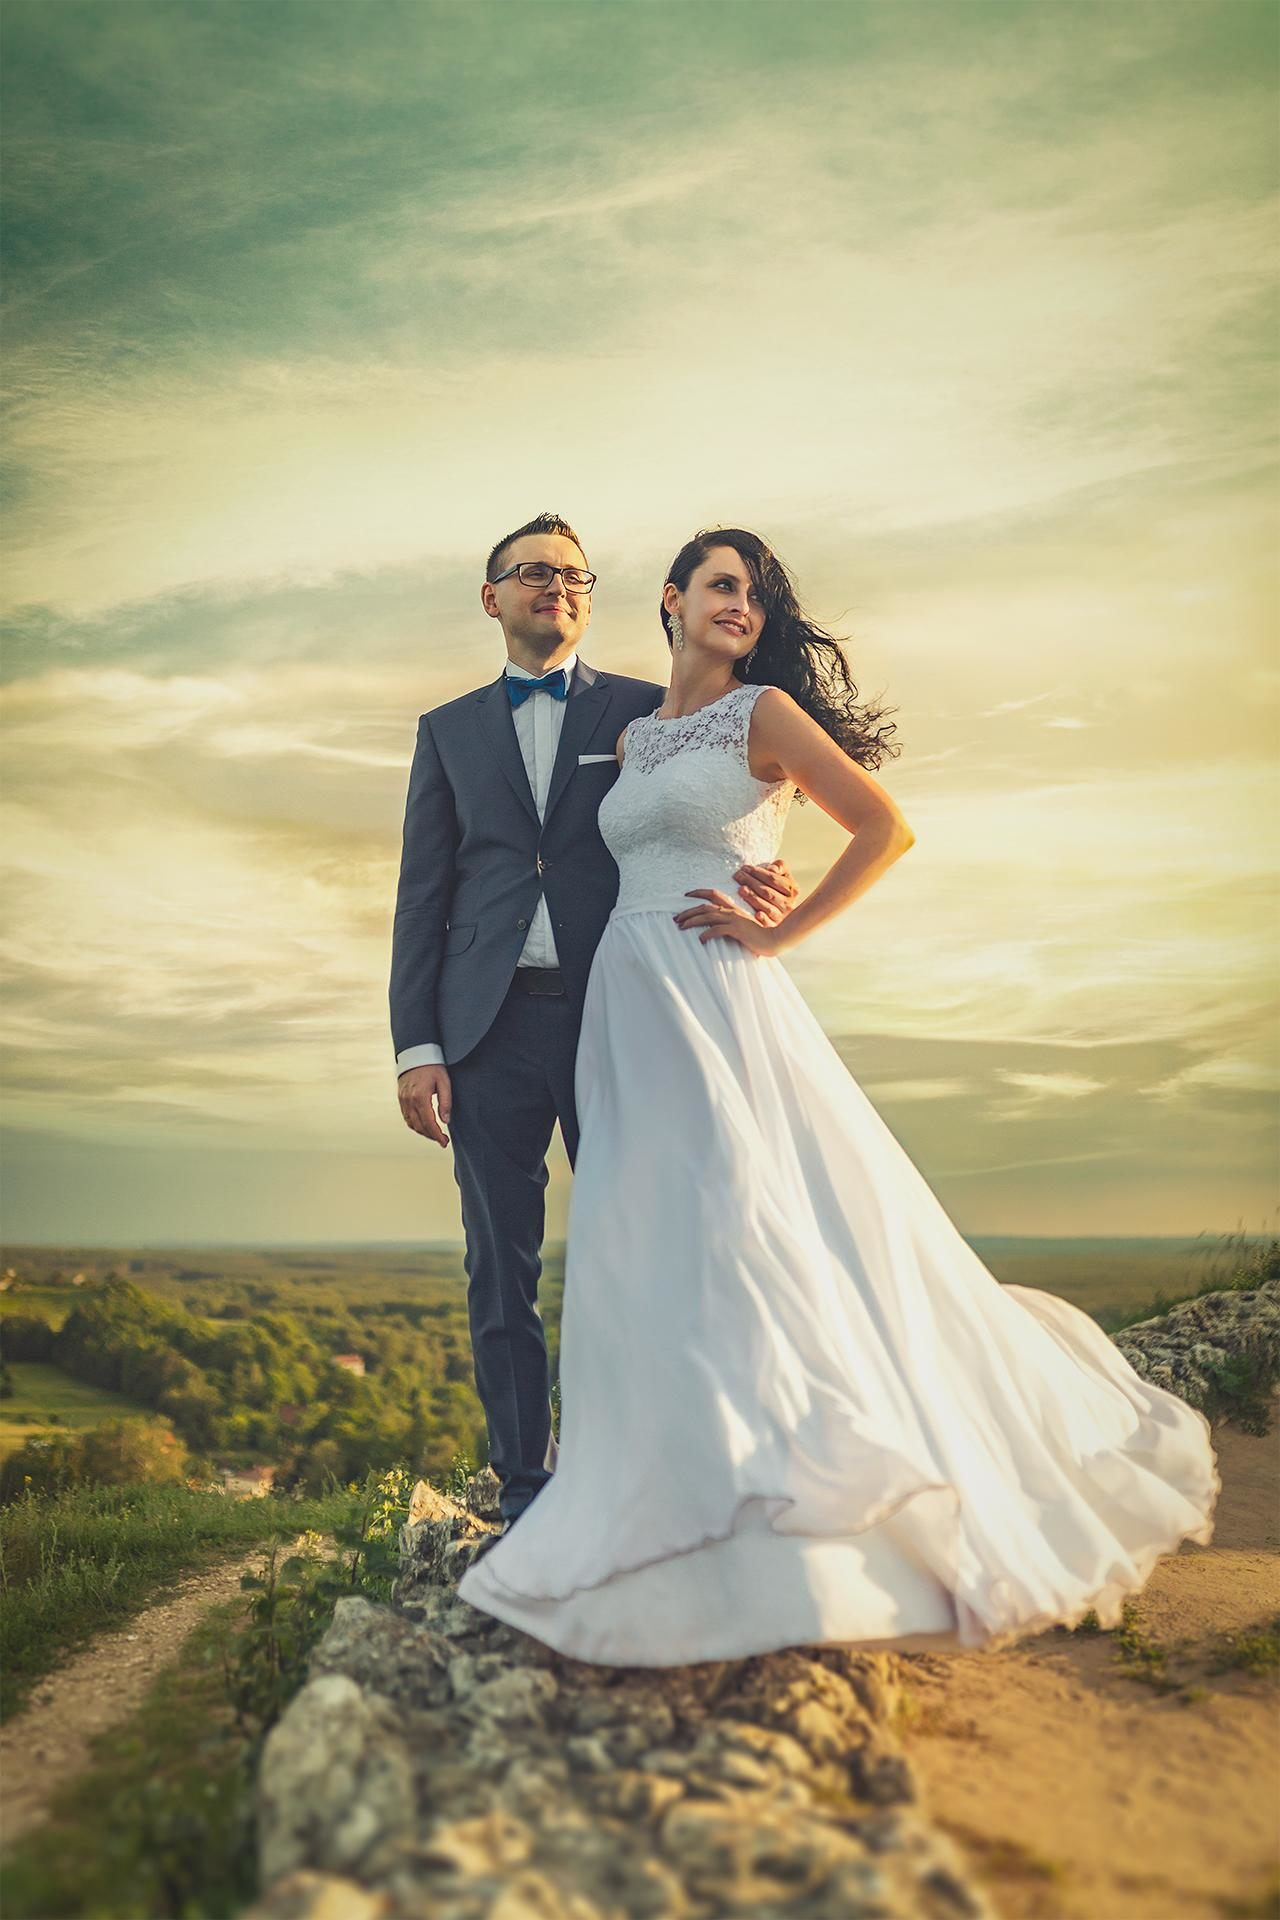 Para młoda - plener ślubny